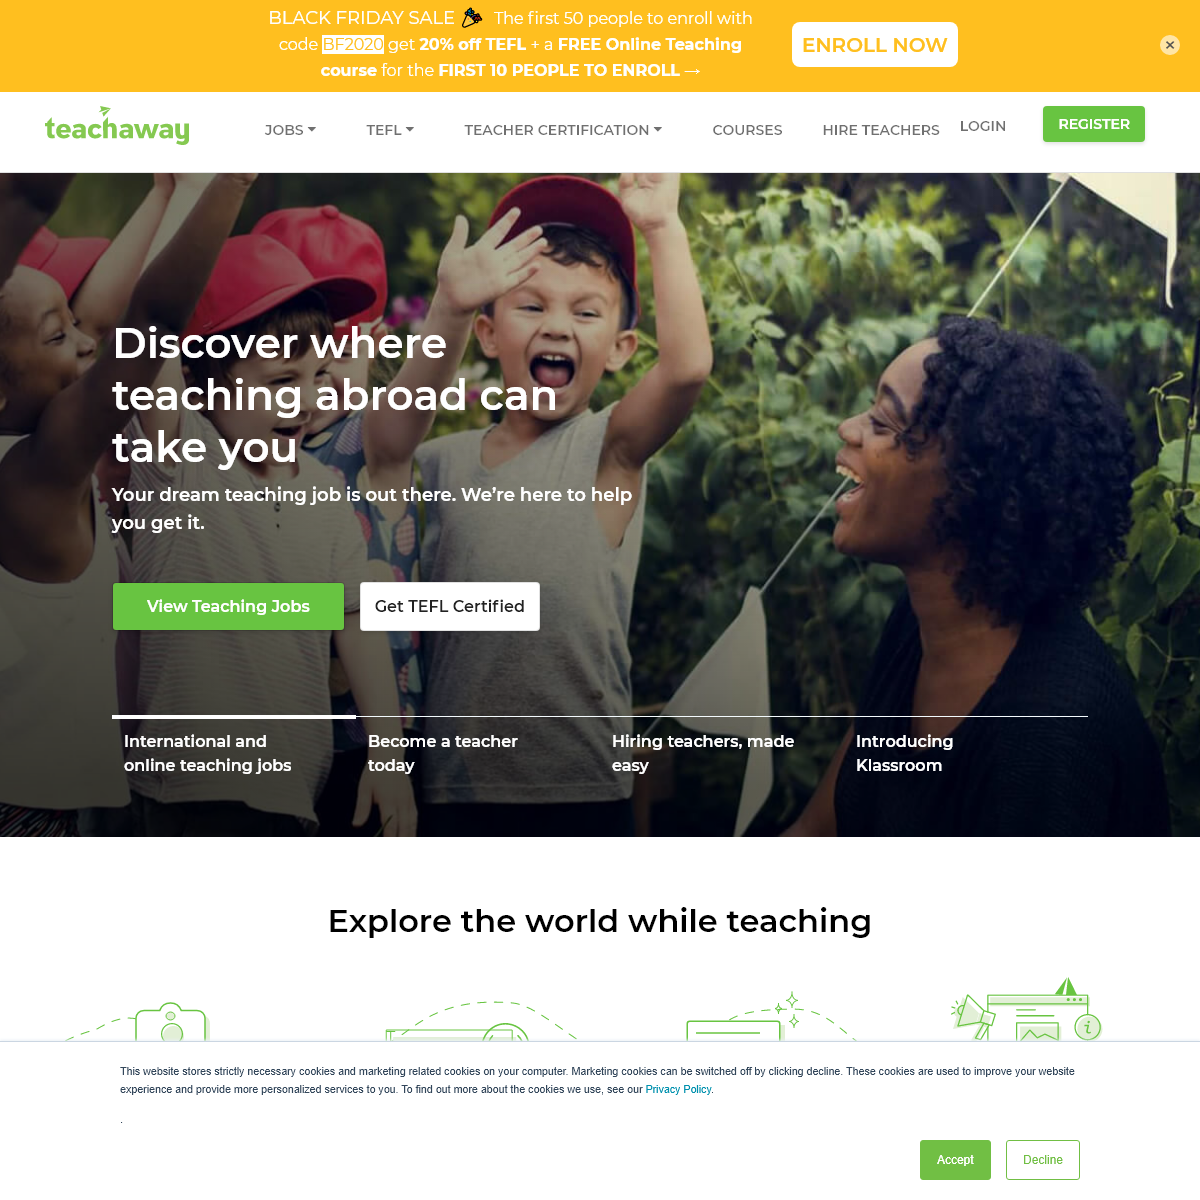 Teach Abroad or Online - Your Dream Teaching Job Awaits